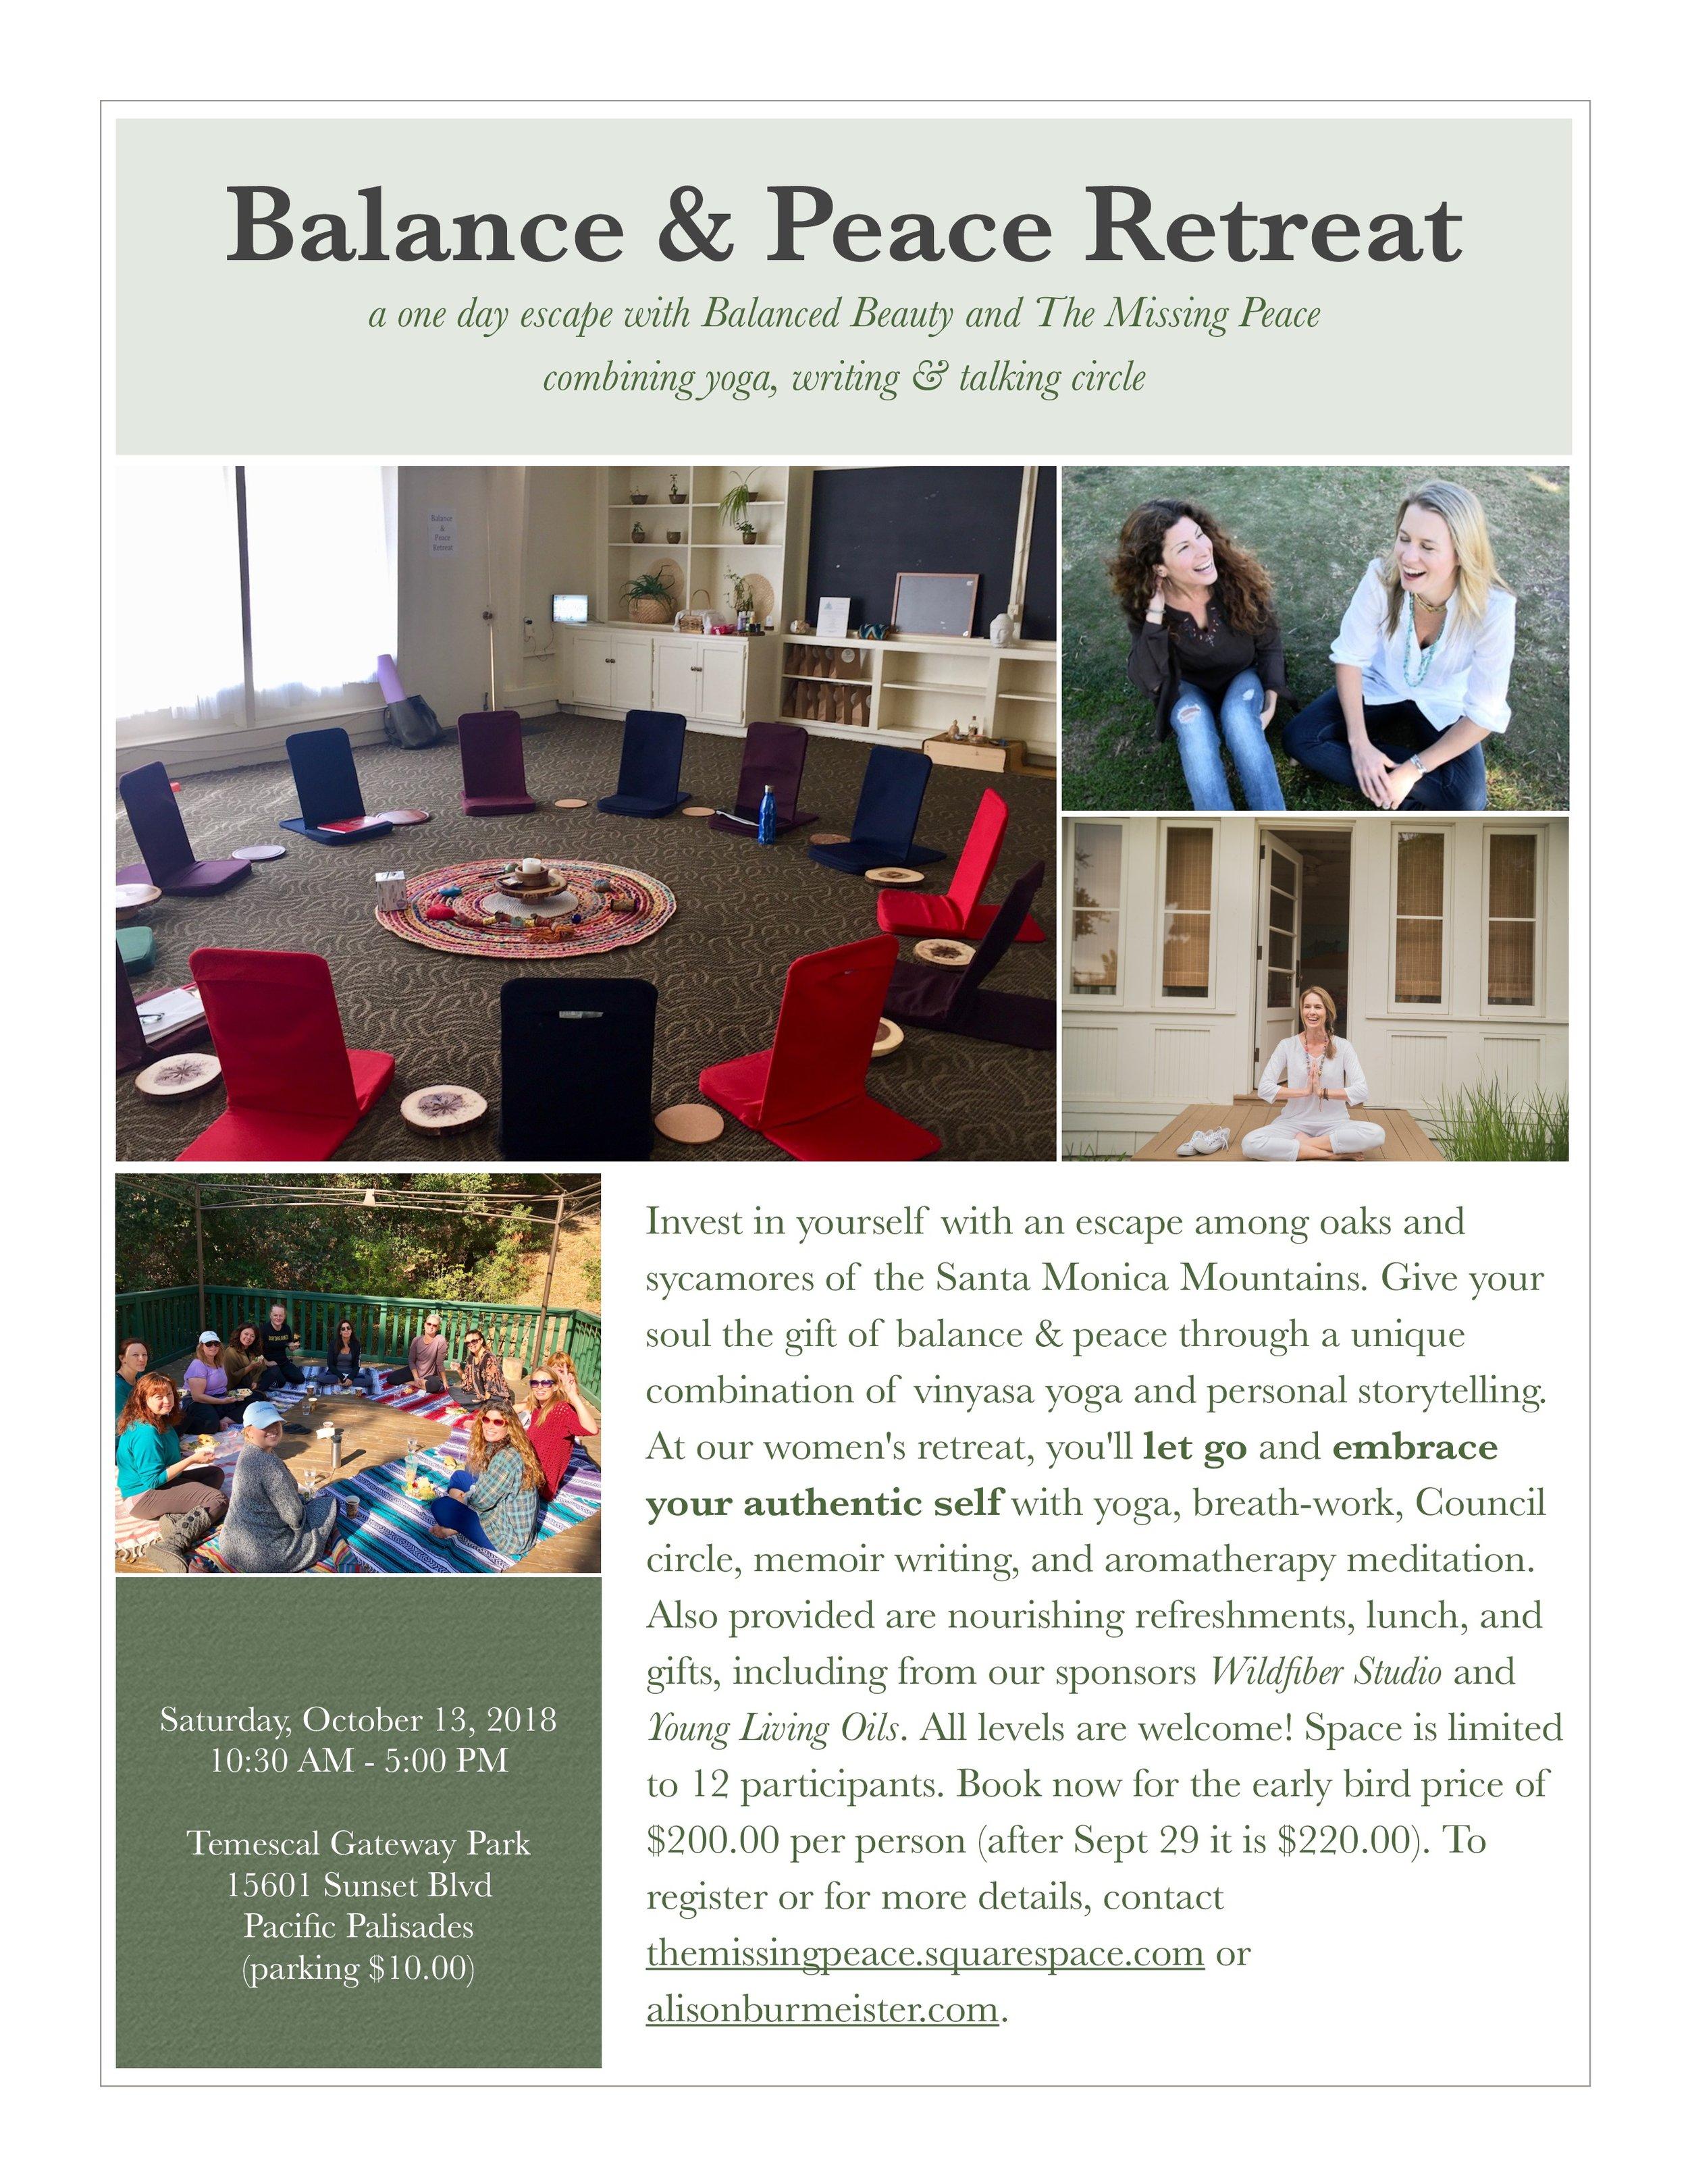 Balance & Peace Retreat 2018-page-0.jpg